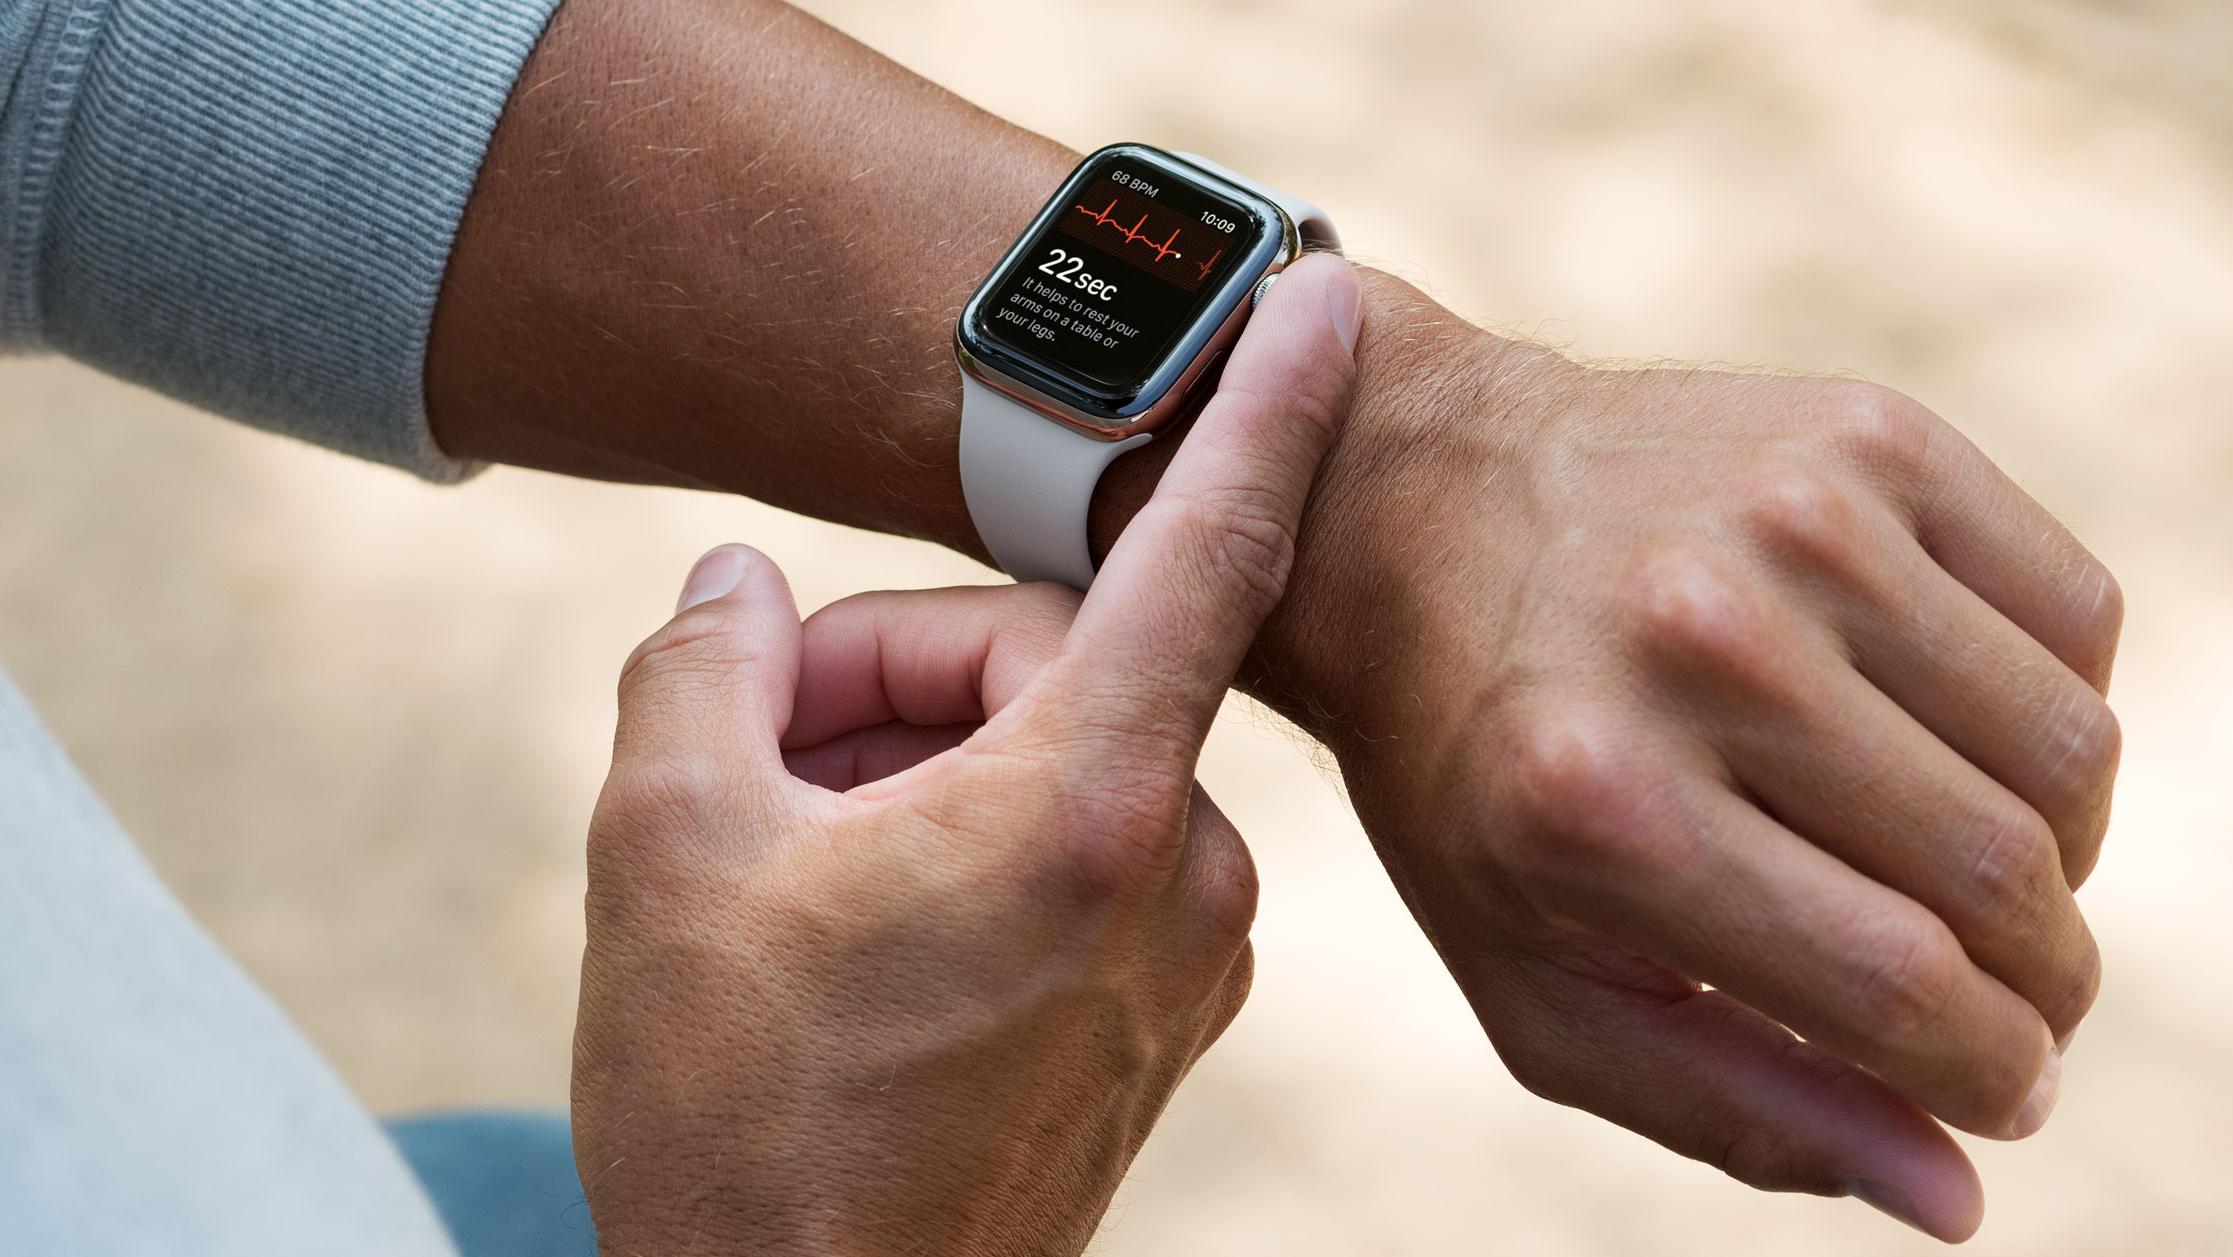 Person wearing Apple Watch, using its ECG app